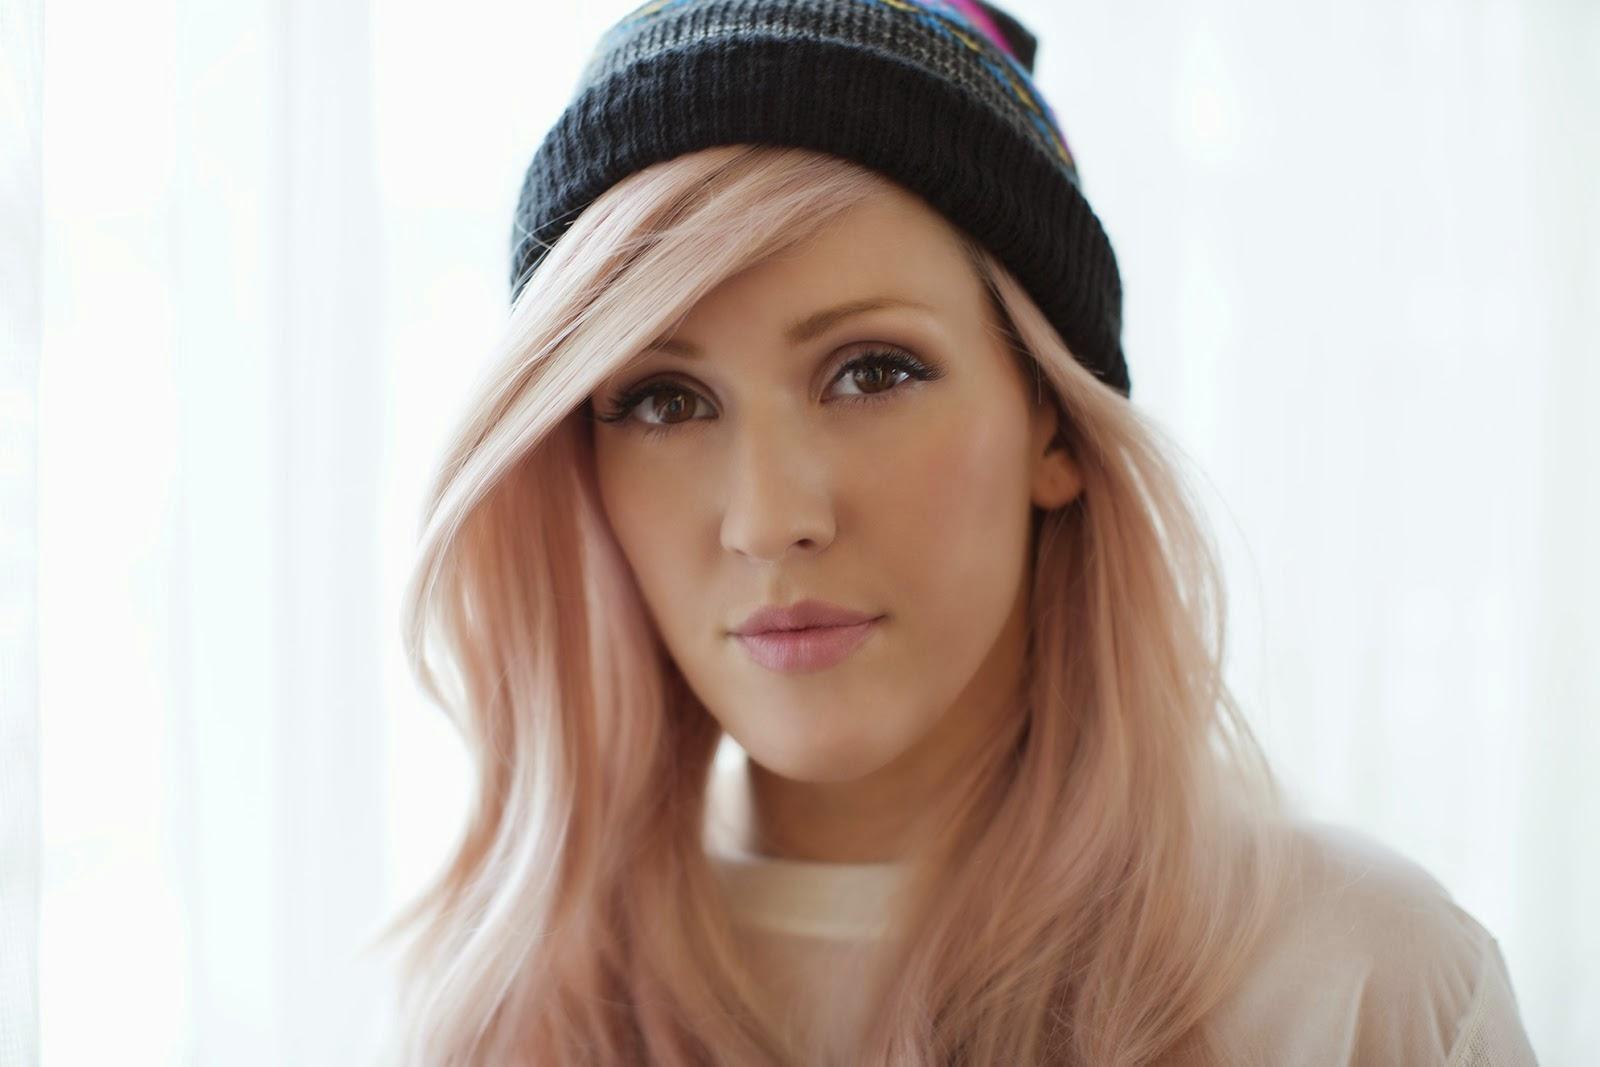 Lirik Lagu Ellie Goulding - Love Me Like You Do